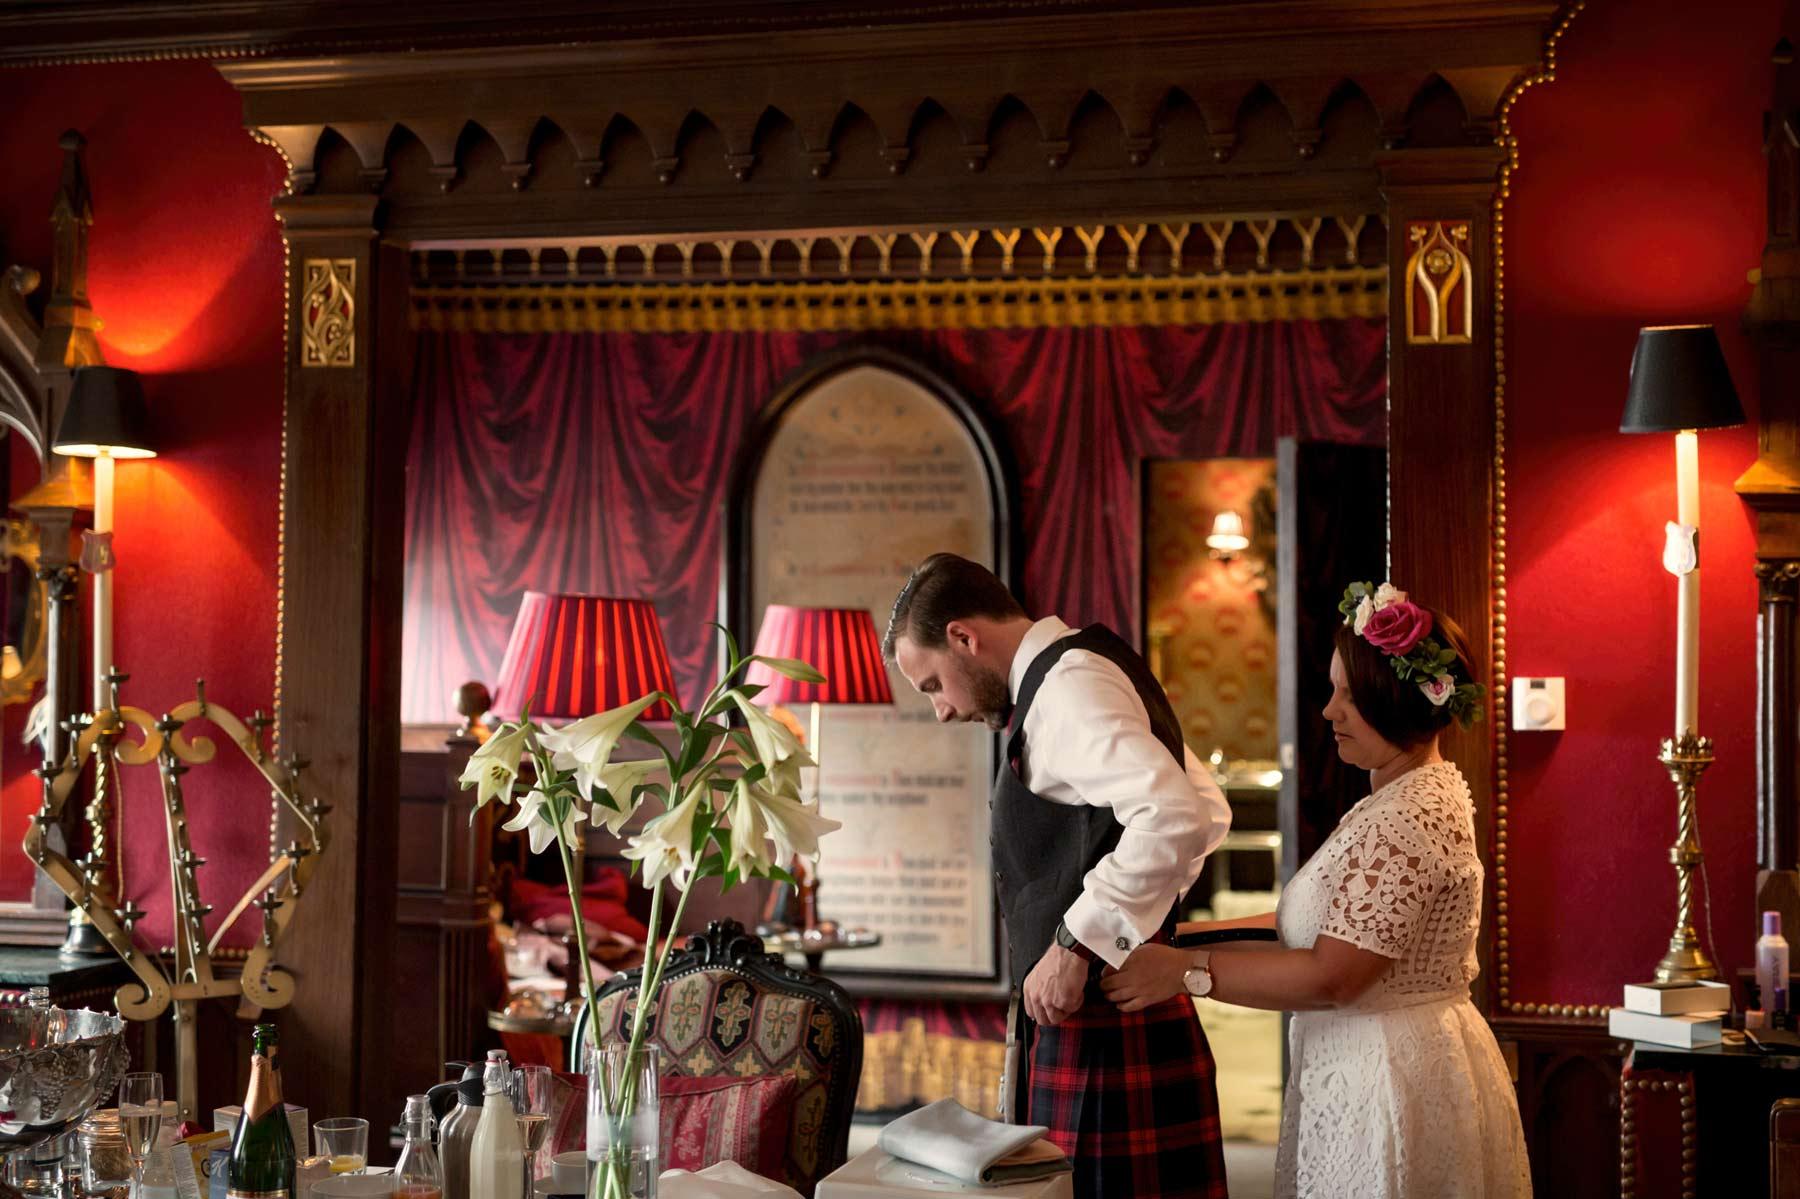 Bride, groom, getting ready, The Witchery, kilt, wedding, Edinburgh